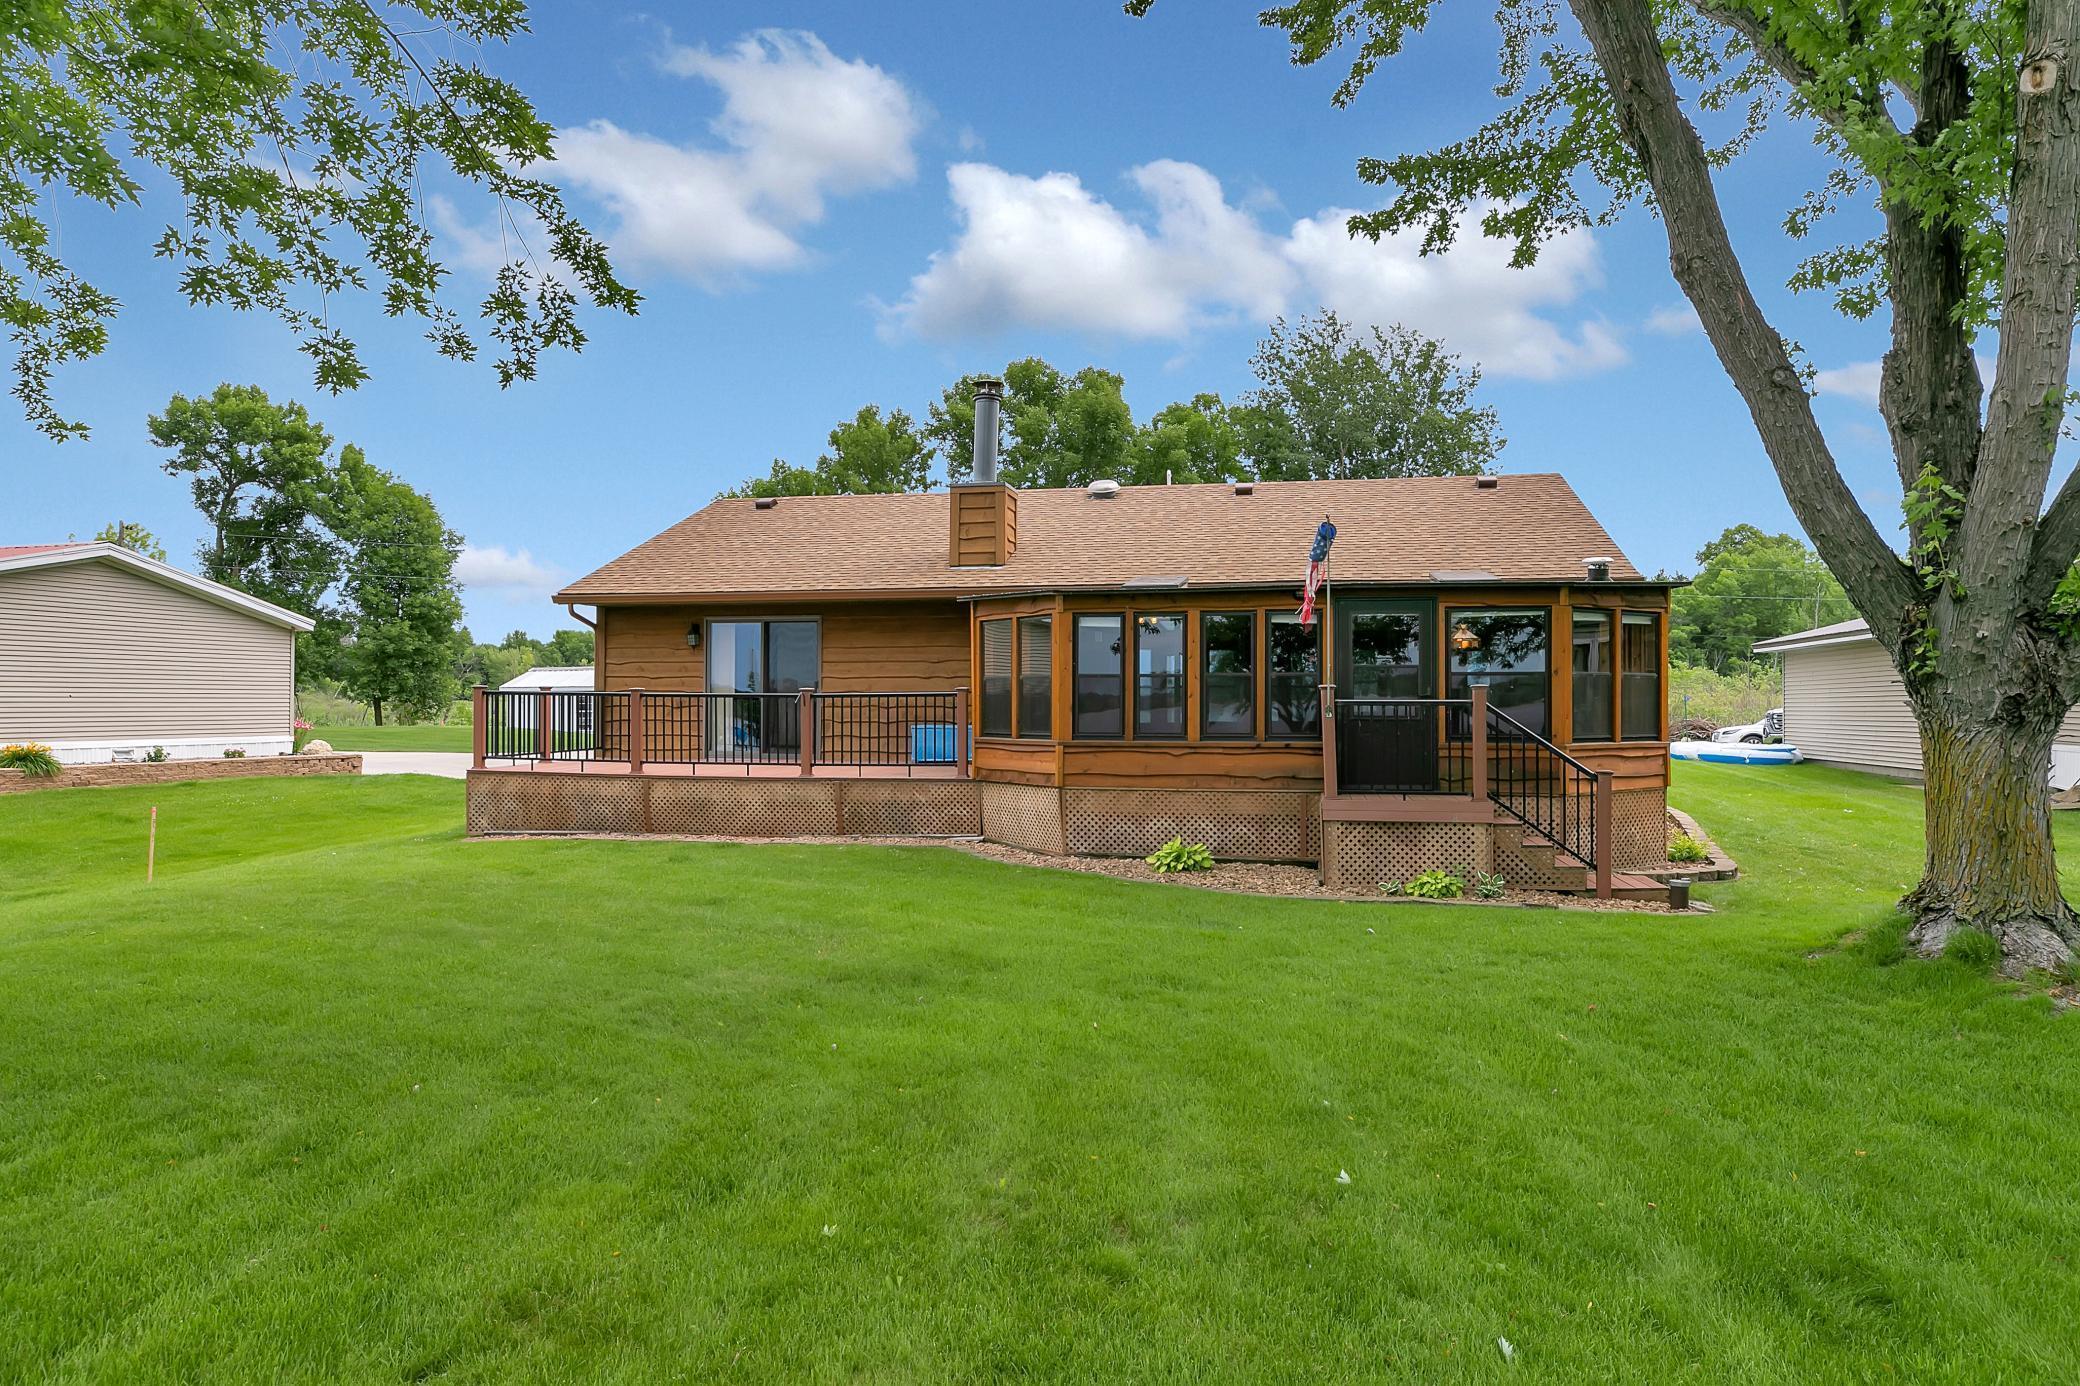 38737 Tamarack Property Photo - Avon, MN real estate listing